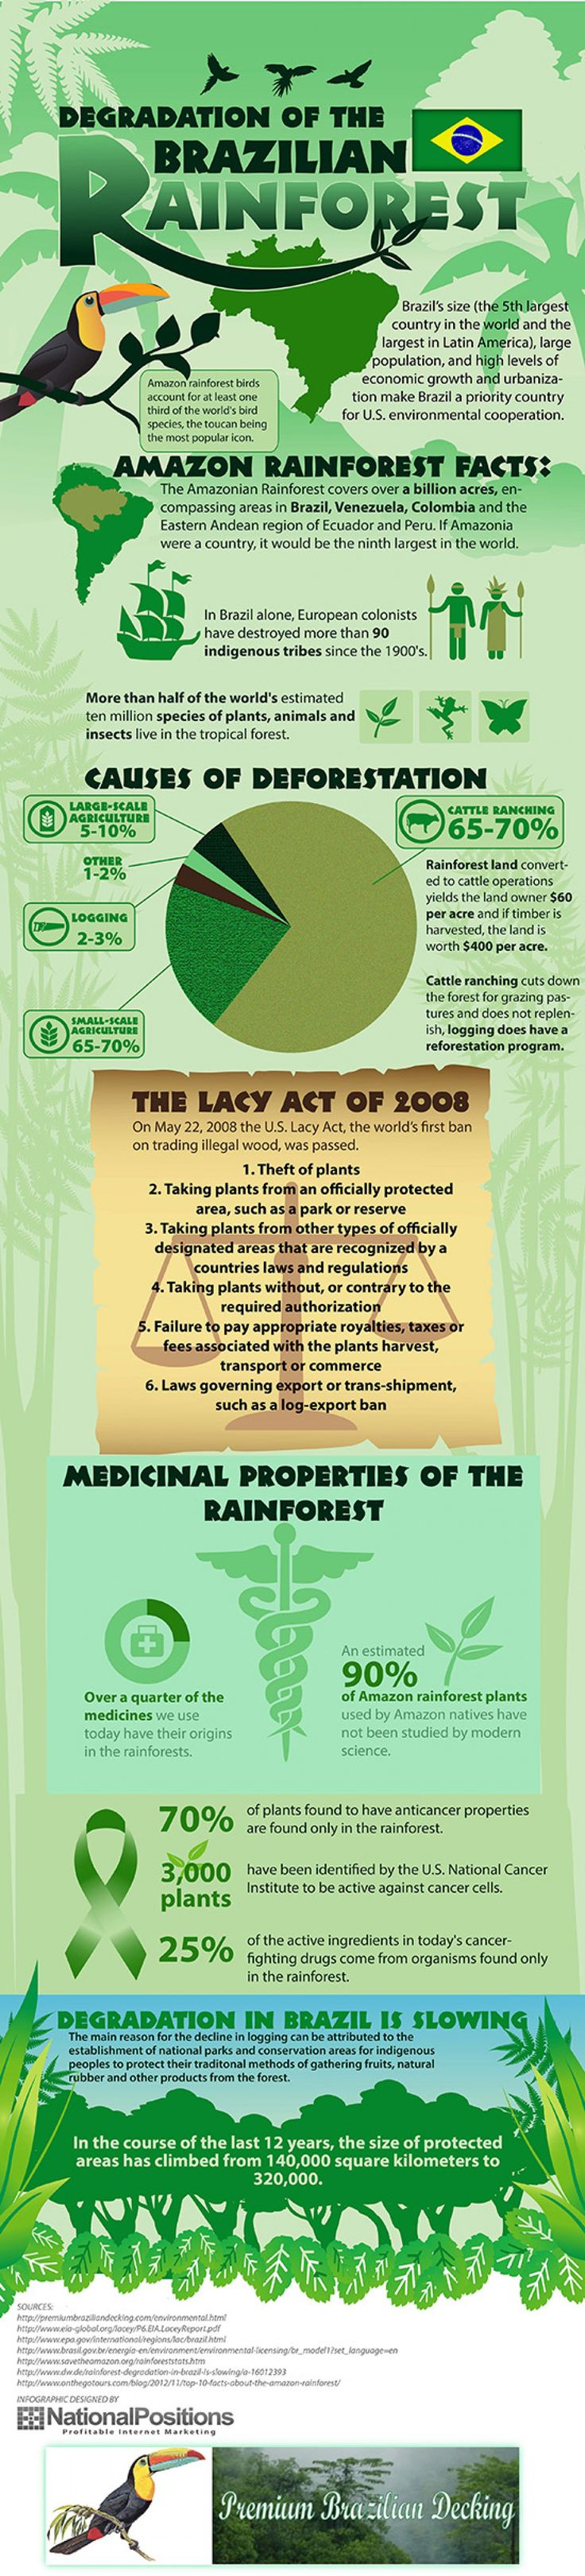 Deforestation of the Amazon Rainforest Infographic